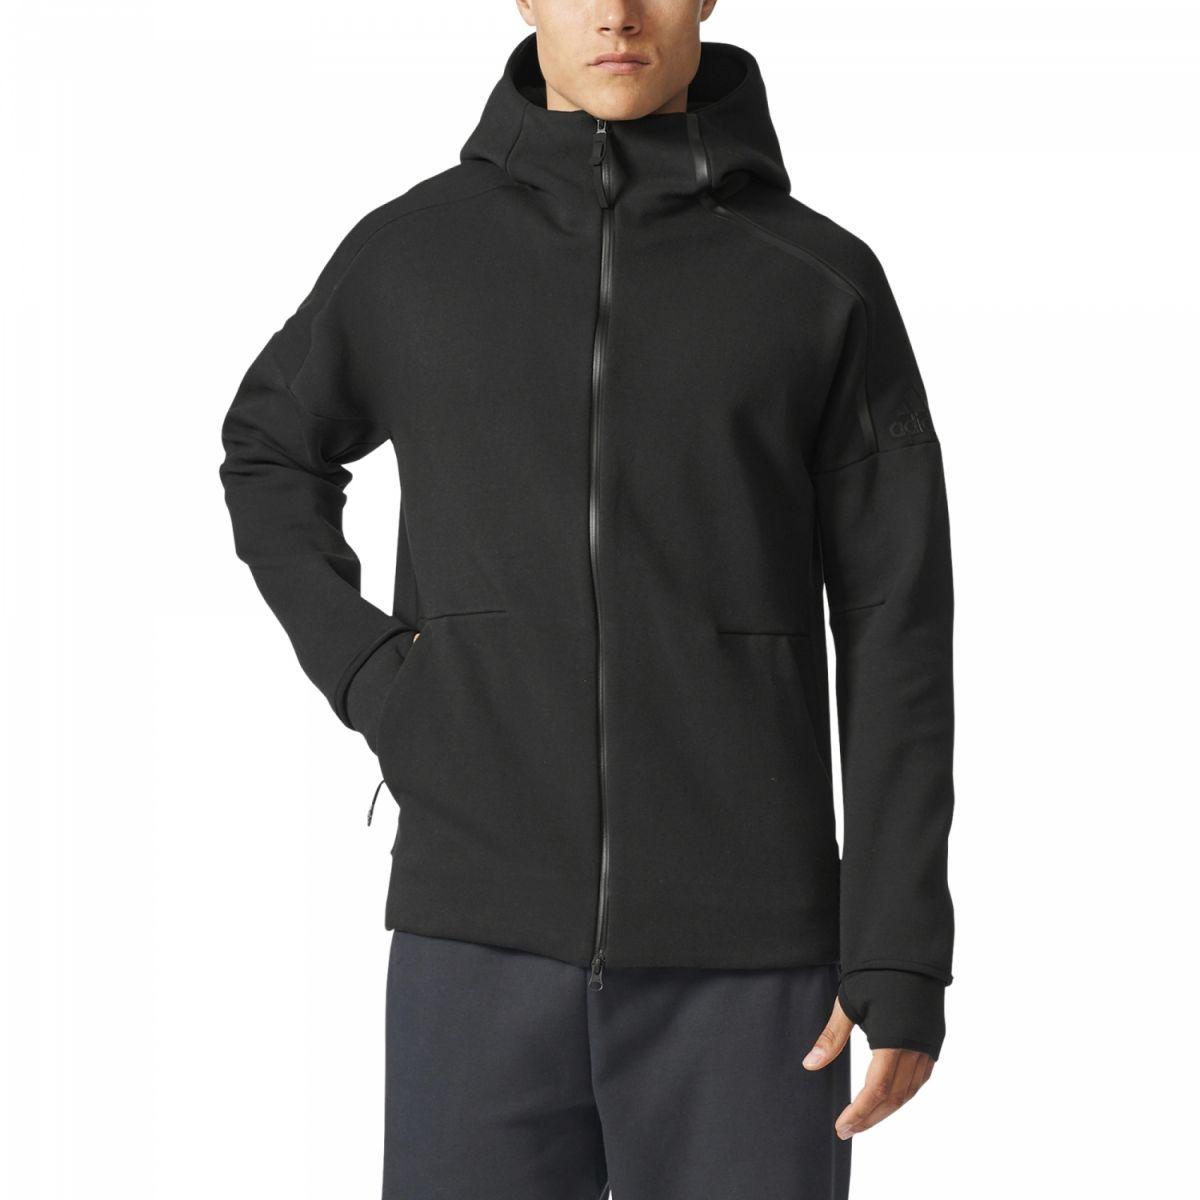 adidas zne hoody herren kapuzenjacke schwarz bq6925 sport klingenmaier. Black Bedroom Furniture Sets. Home Design Ideas